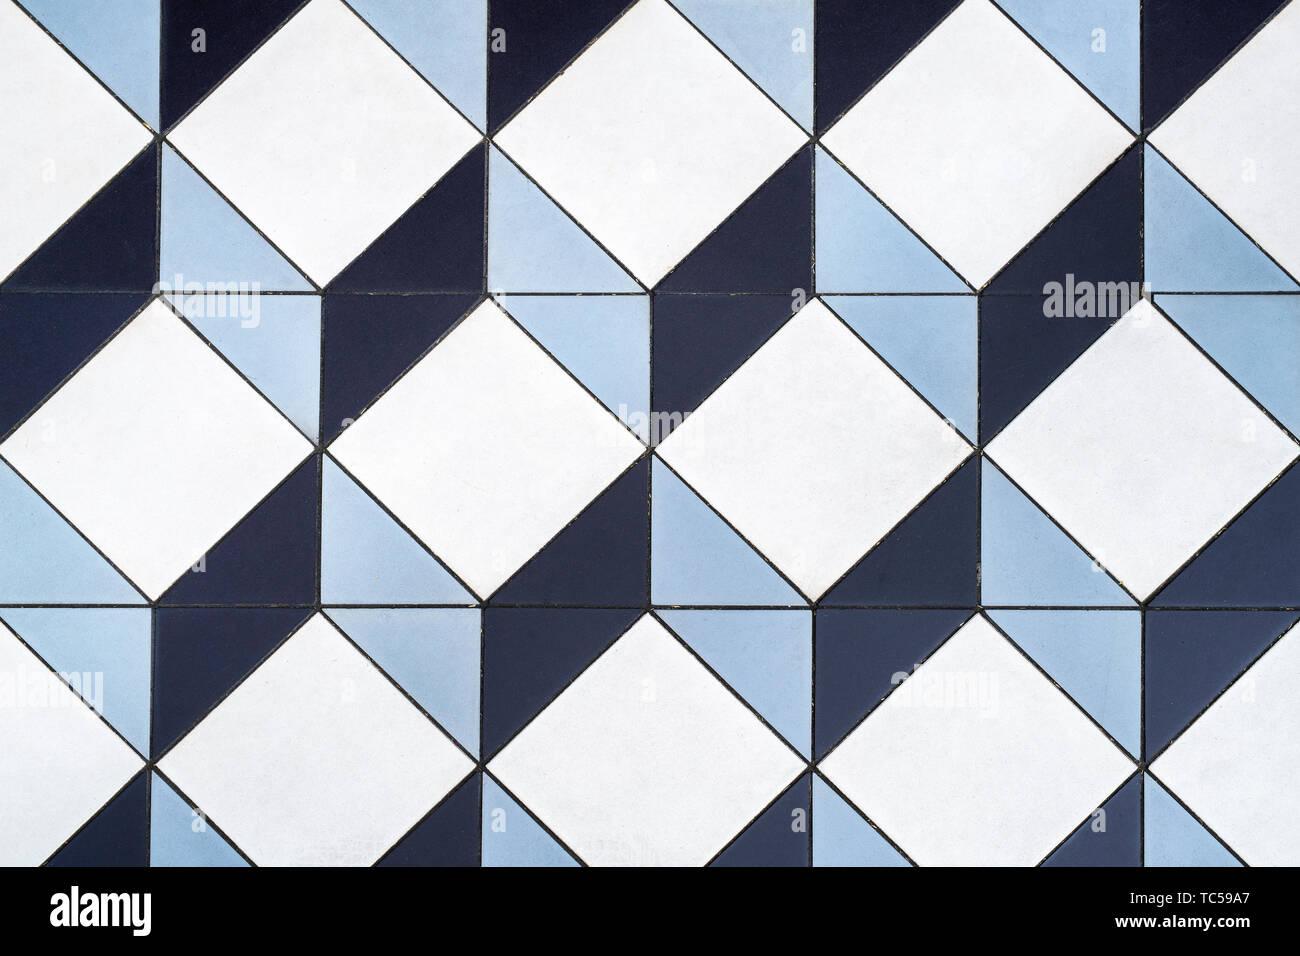 3D Cube Mosaic Tiles. Geometric three dimensional cube floor tiles. London, England Stock Photo